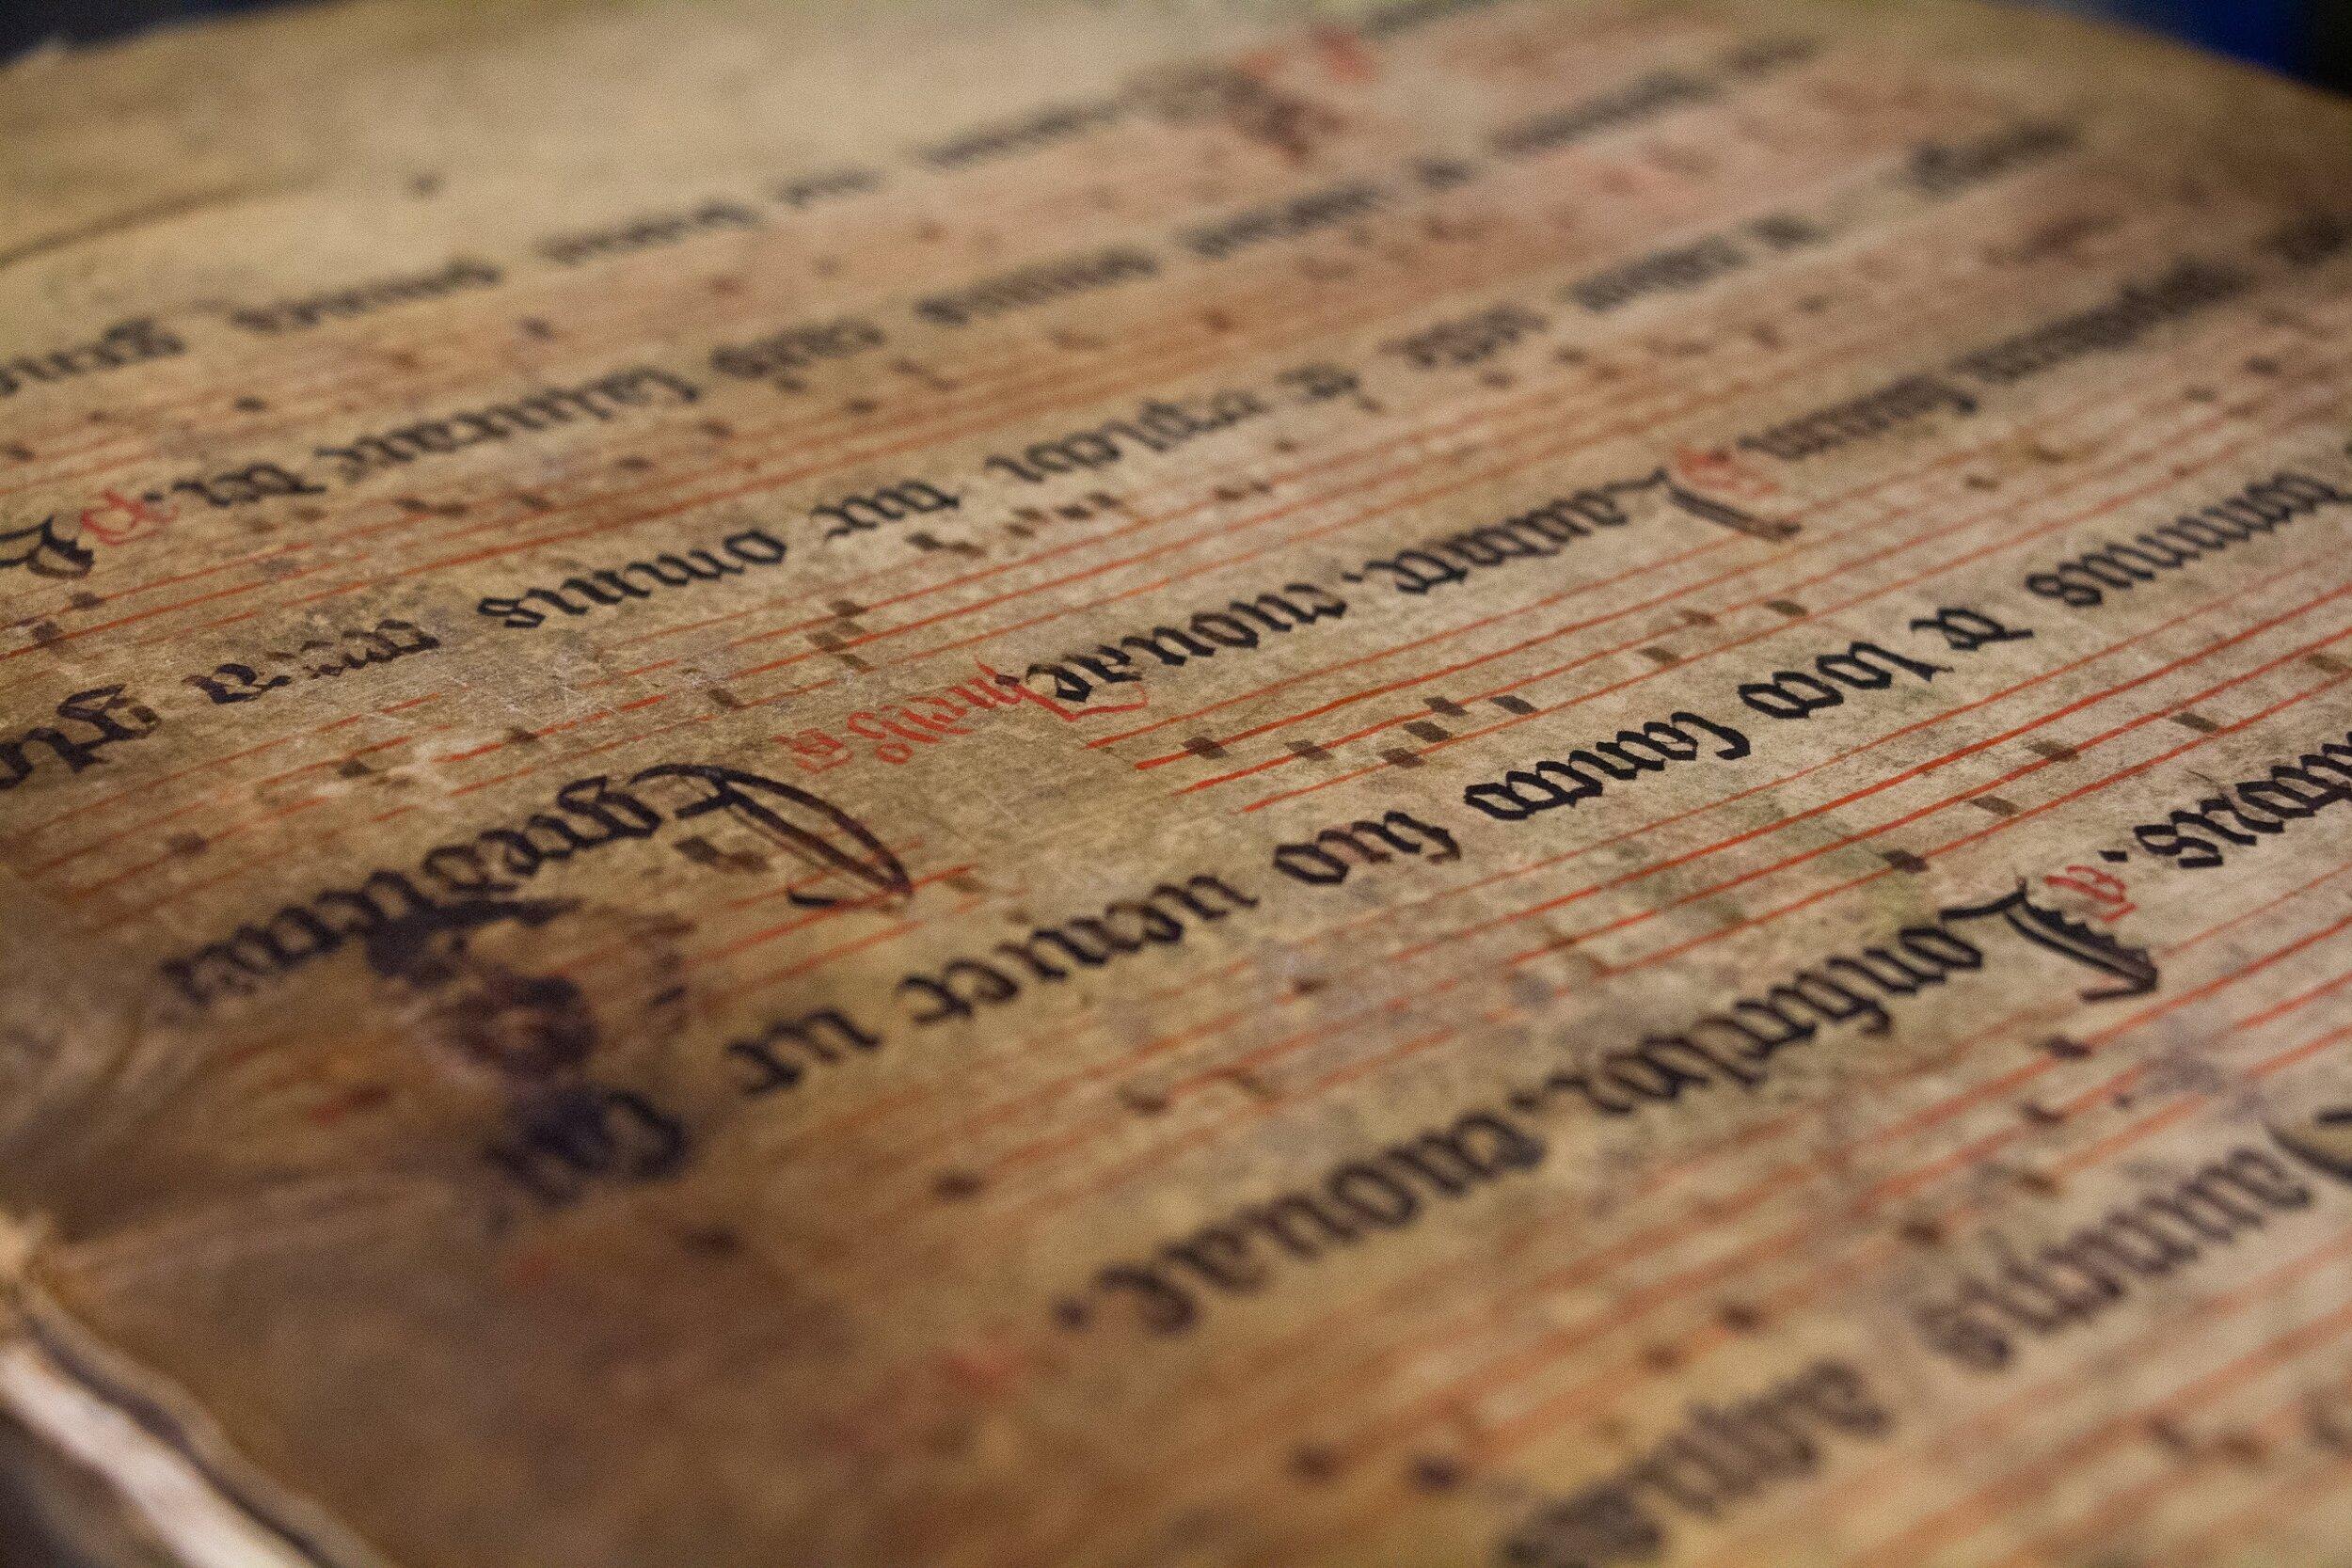 Manuscript from the Plantin-Moretus